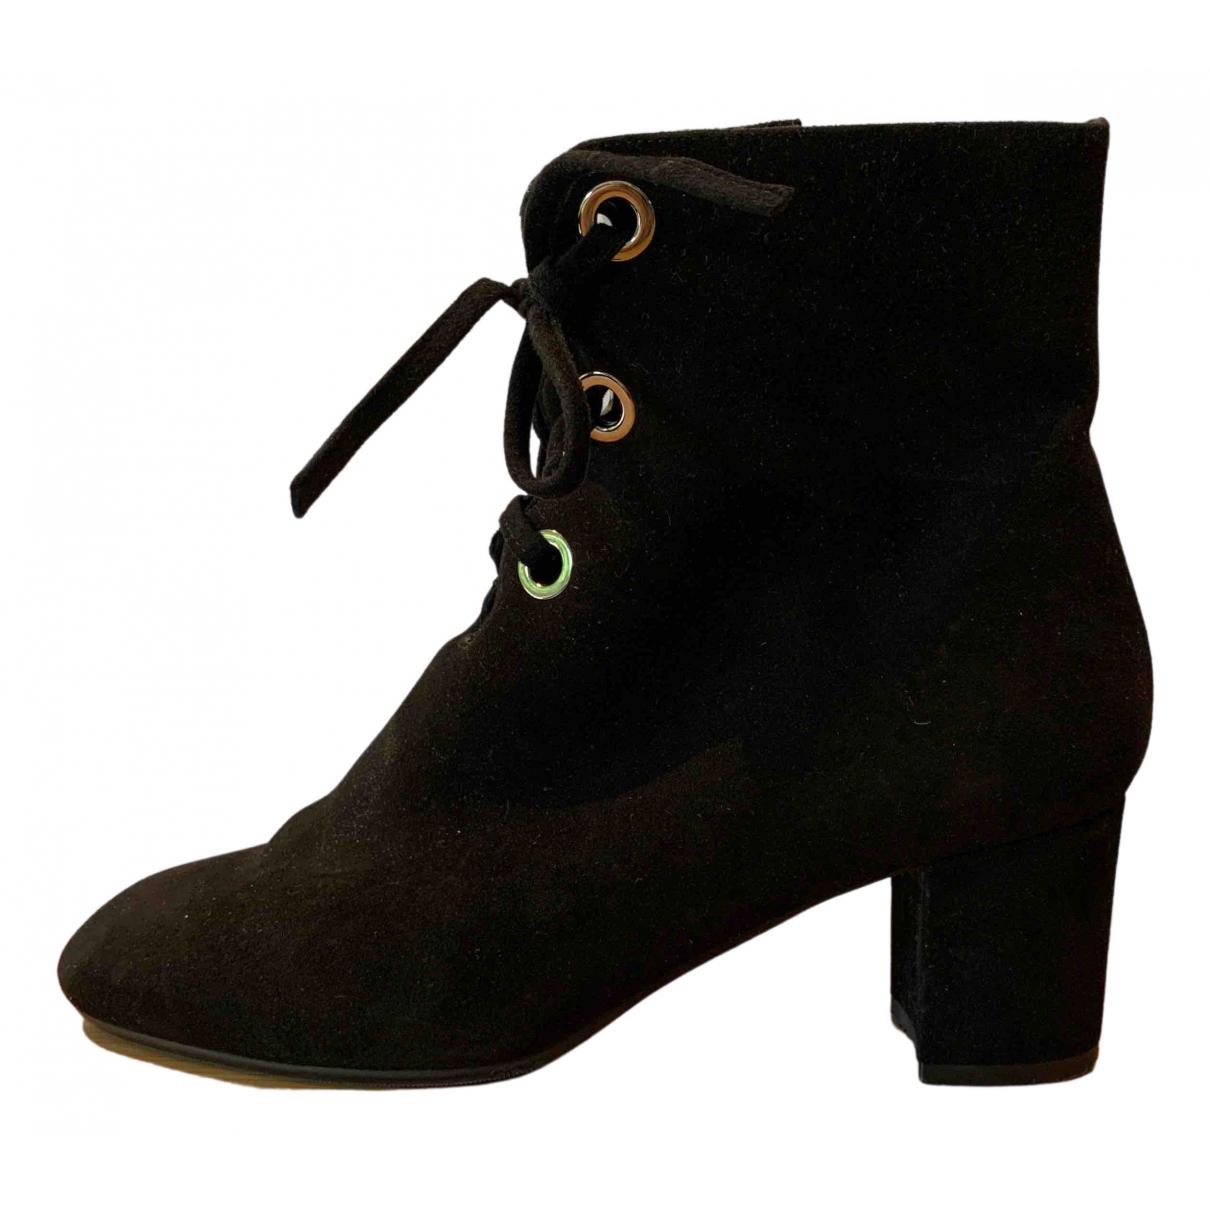 Lk Bennett - Boots   pour femme en suede - noir